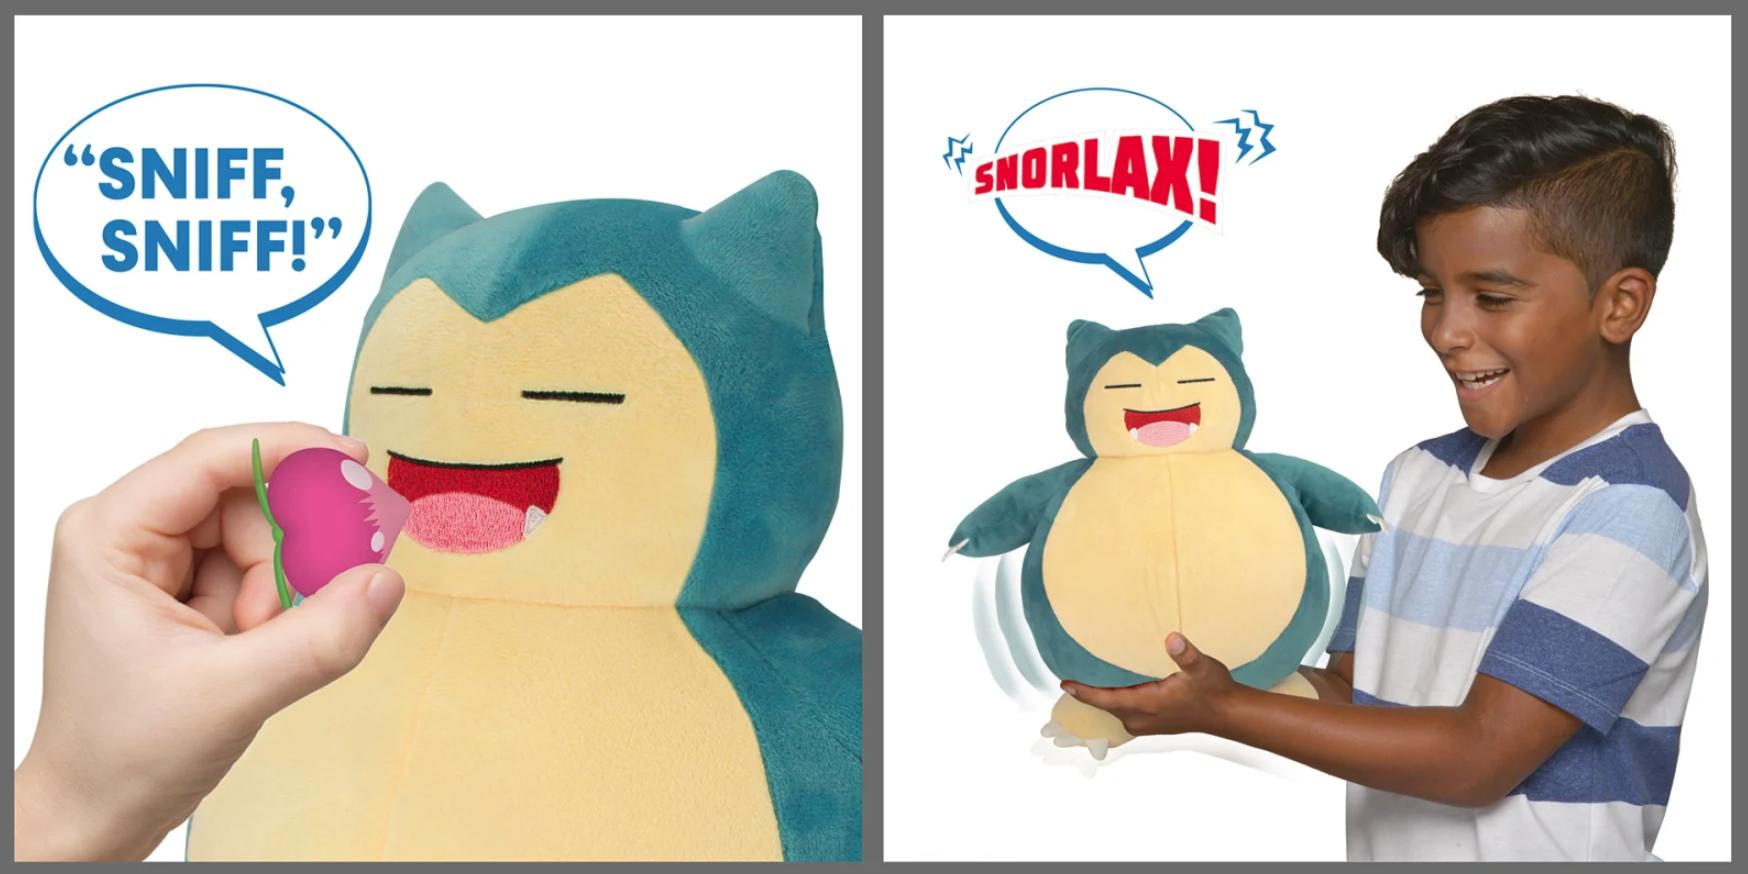 New Pokémon toys - Snooze Action Snorlax